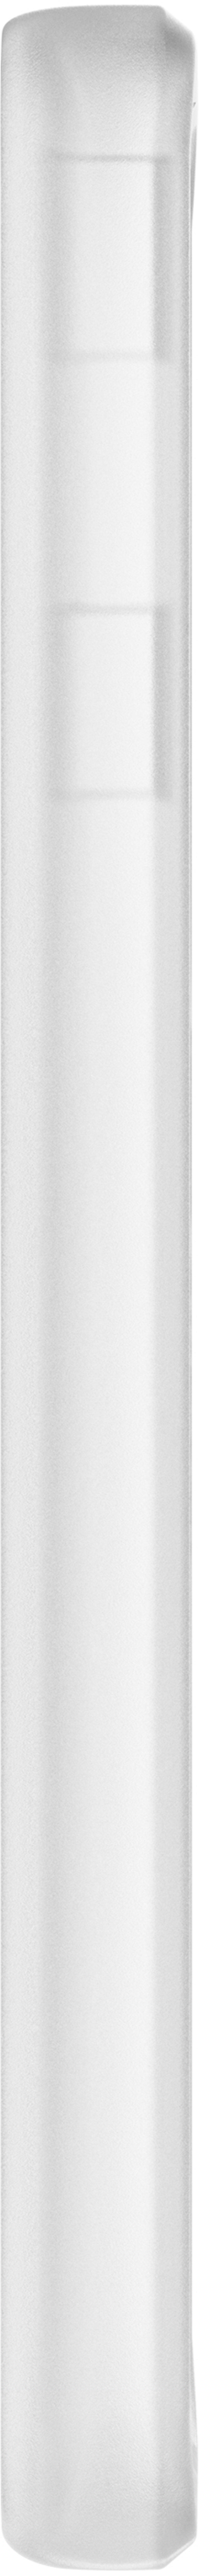 Otterbox React Series Klar Samsung Galaxy S21 Ultra